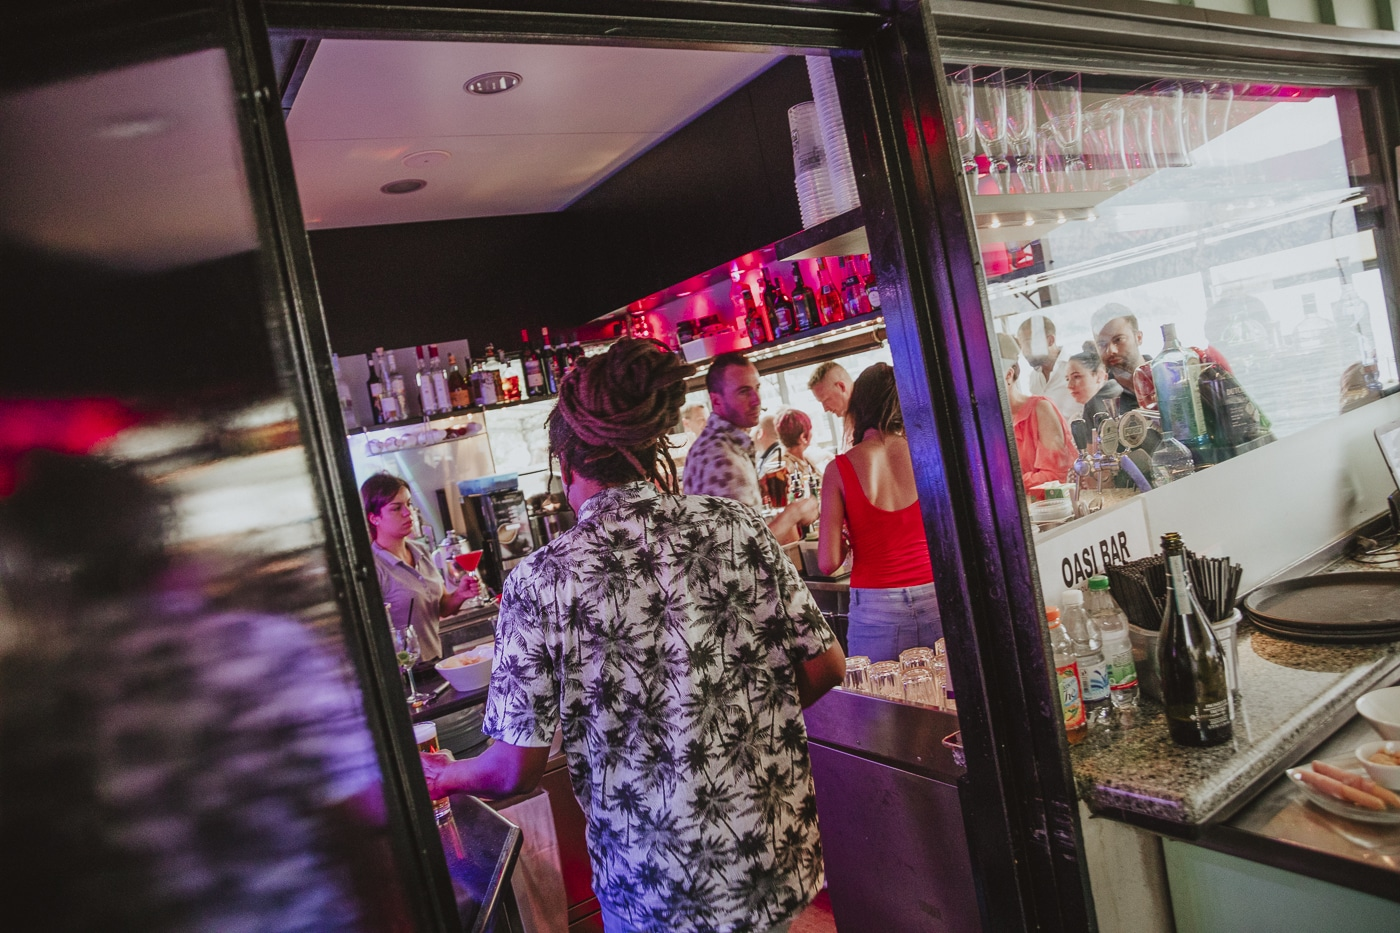 dreadlock man with tropical shirt working behind bar making drinks for a wedding in lake garda, italy by Joshua Wyborn